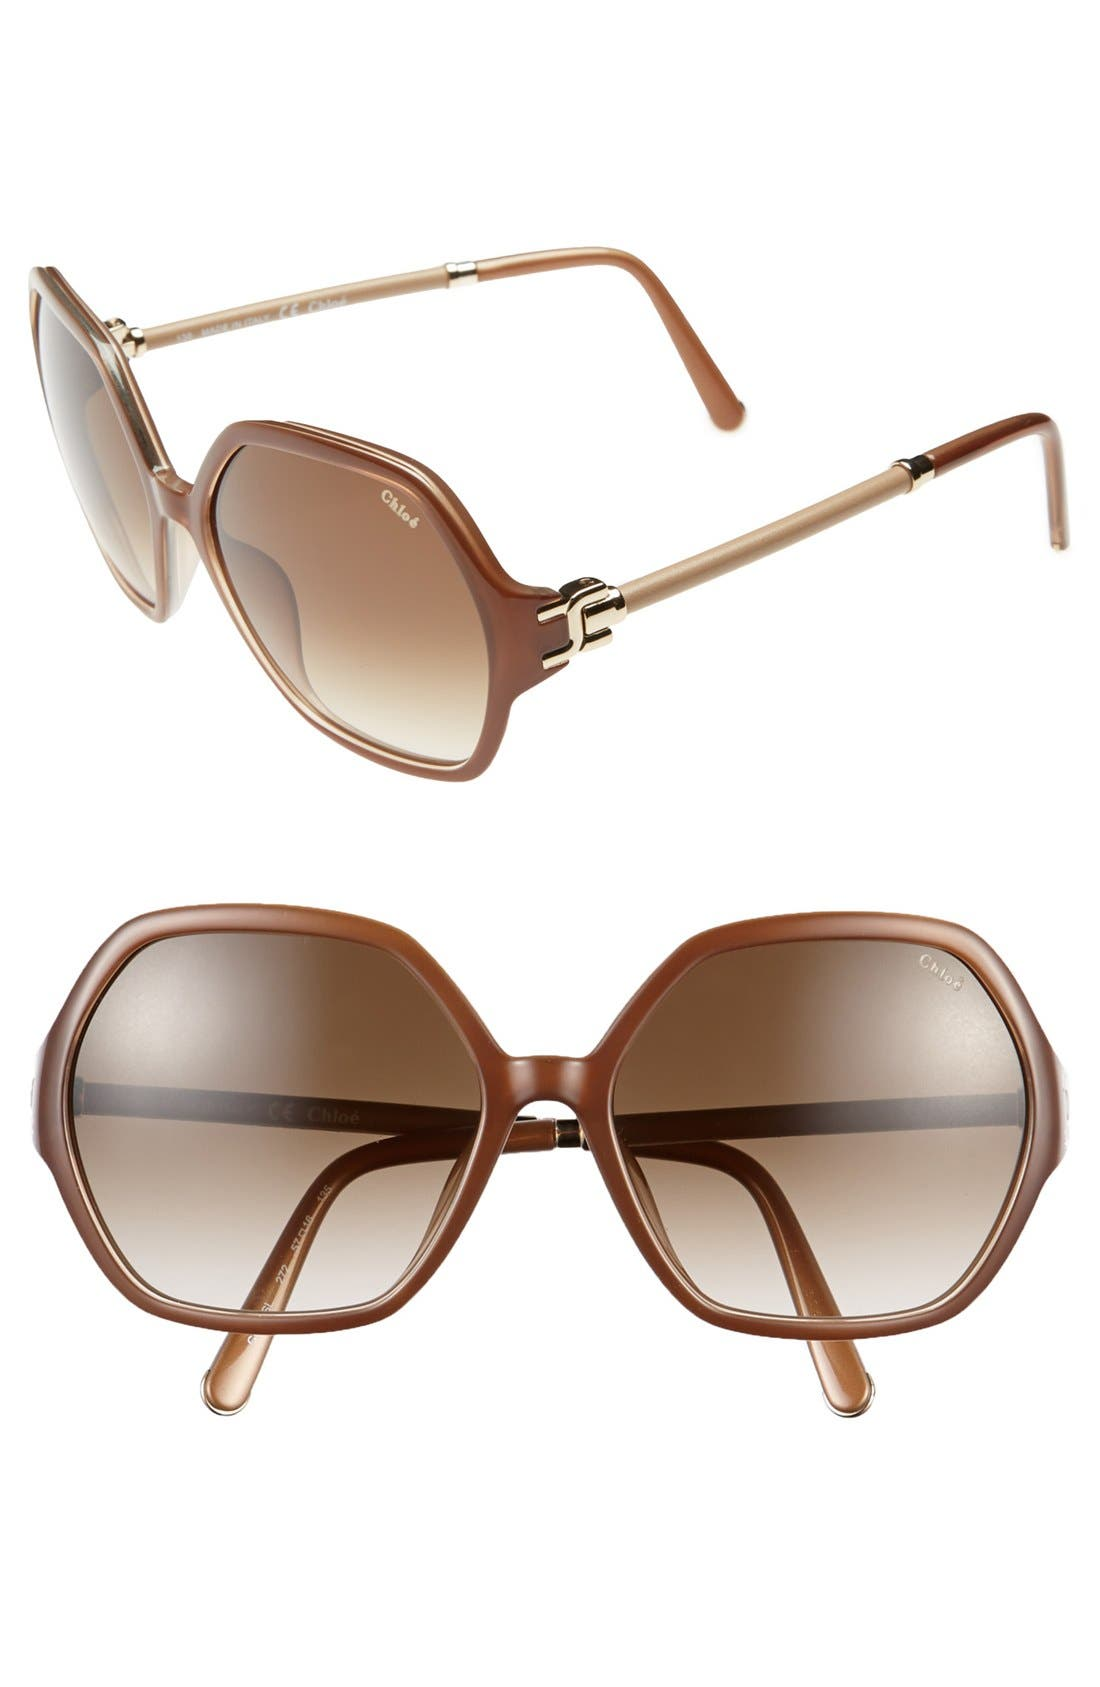 Main Image - Chloe 'Marcie' 57mm Oversized Sunglasses